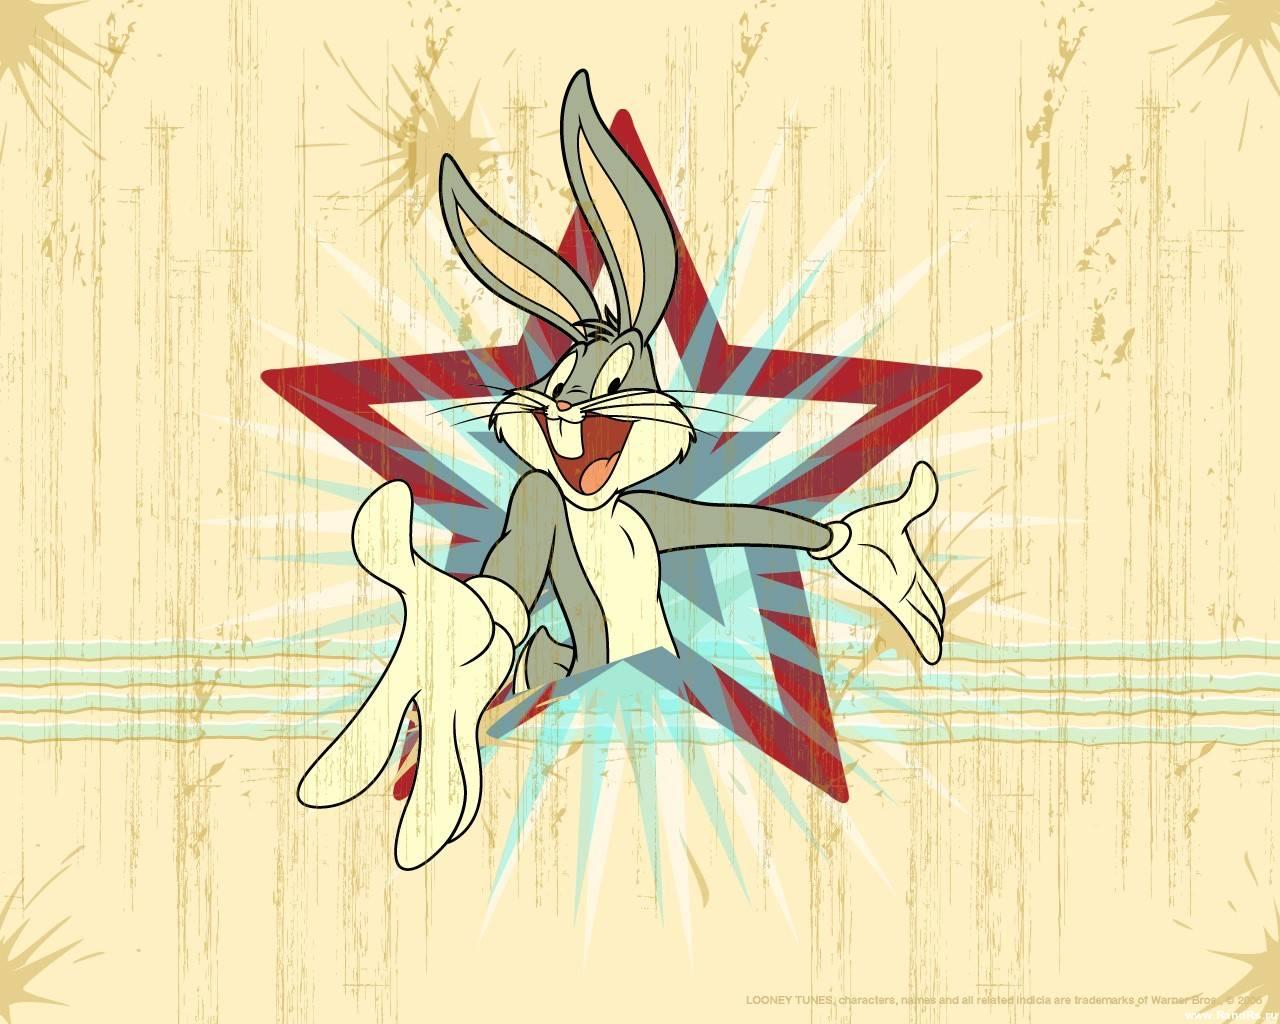 76 Bugs Bunny Wallpaper On Wallpapersafari